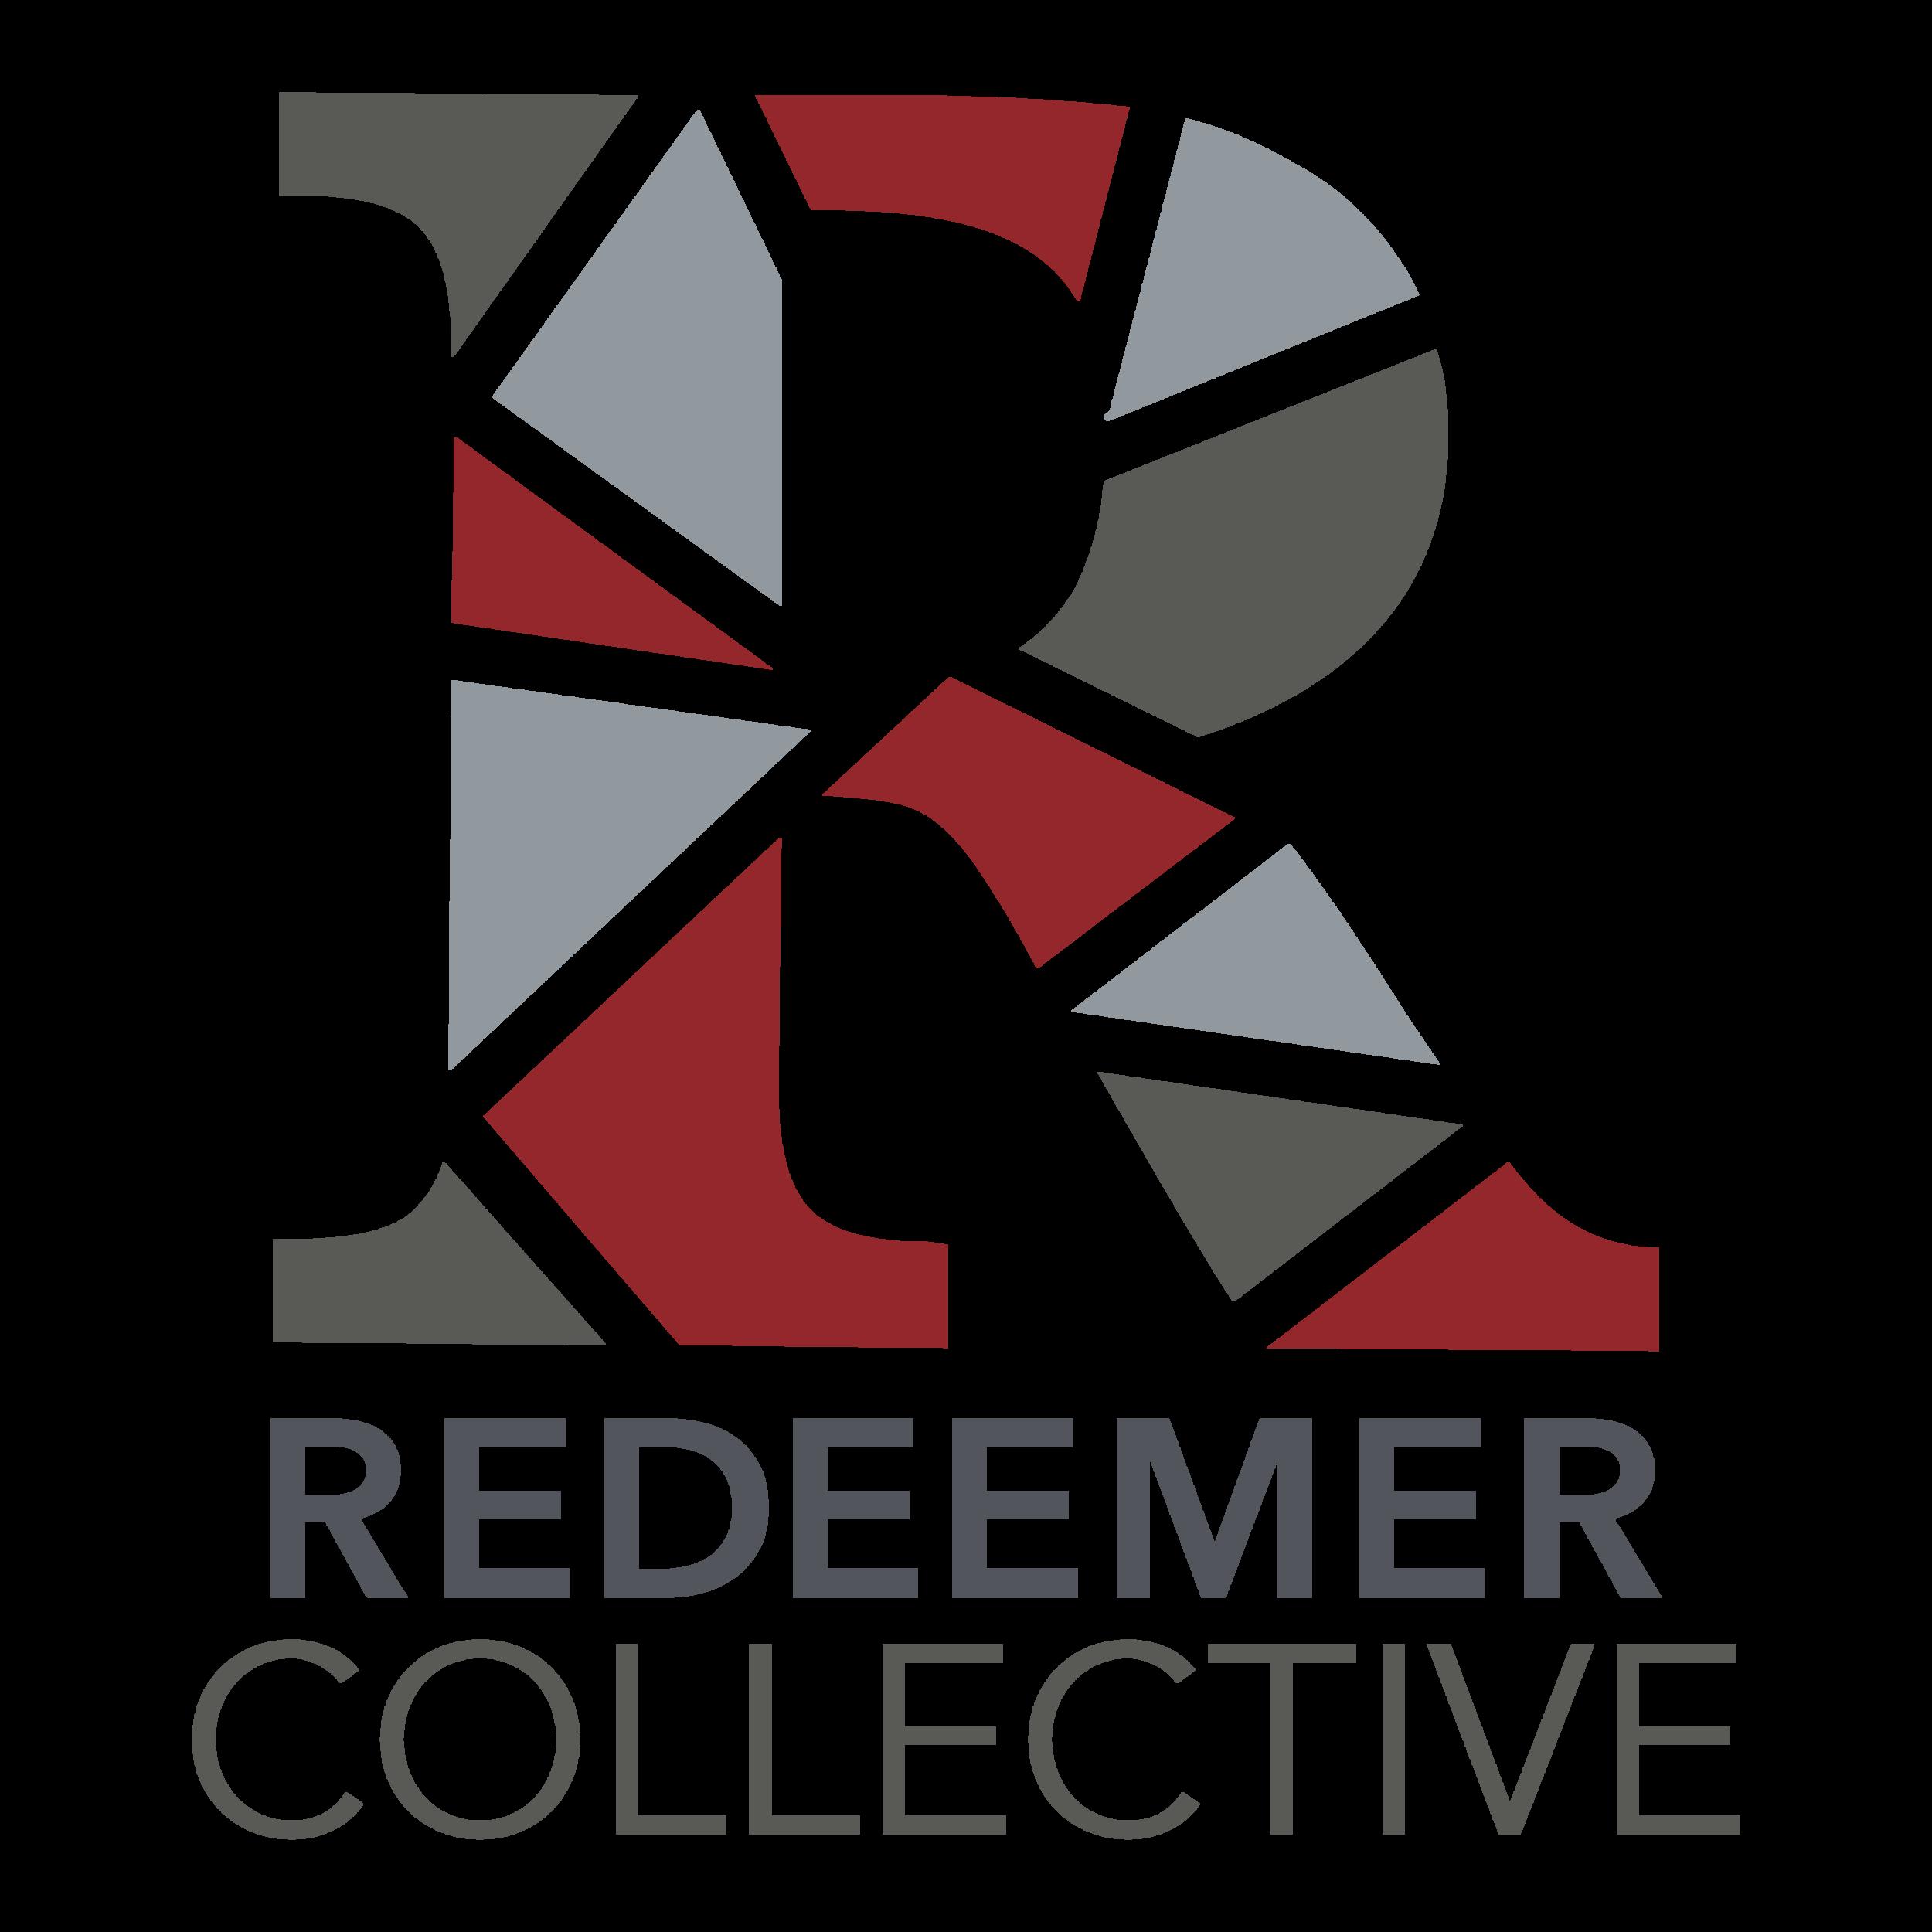 Redeemer Collective Logos_Big Big R.png